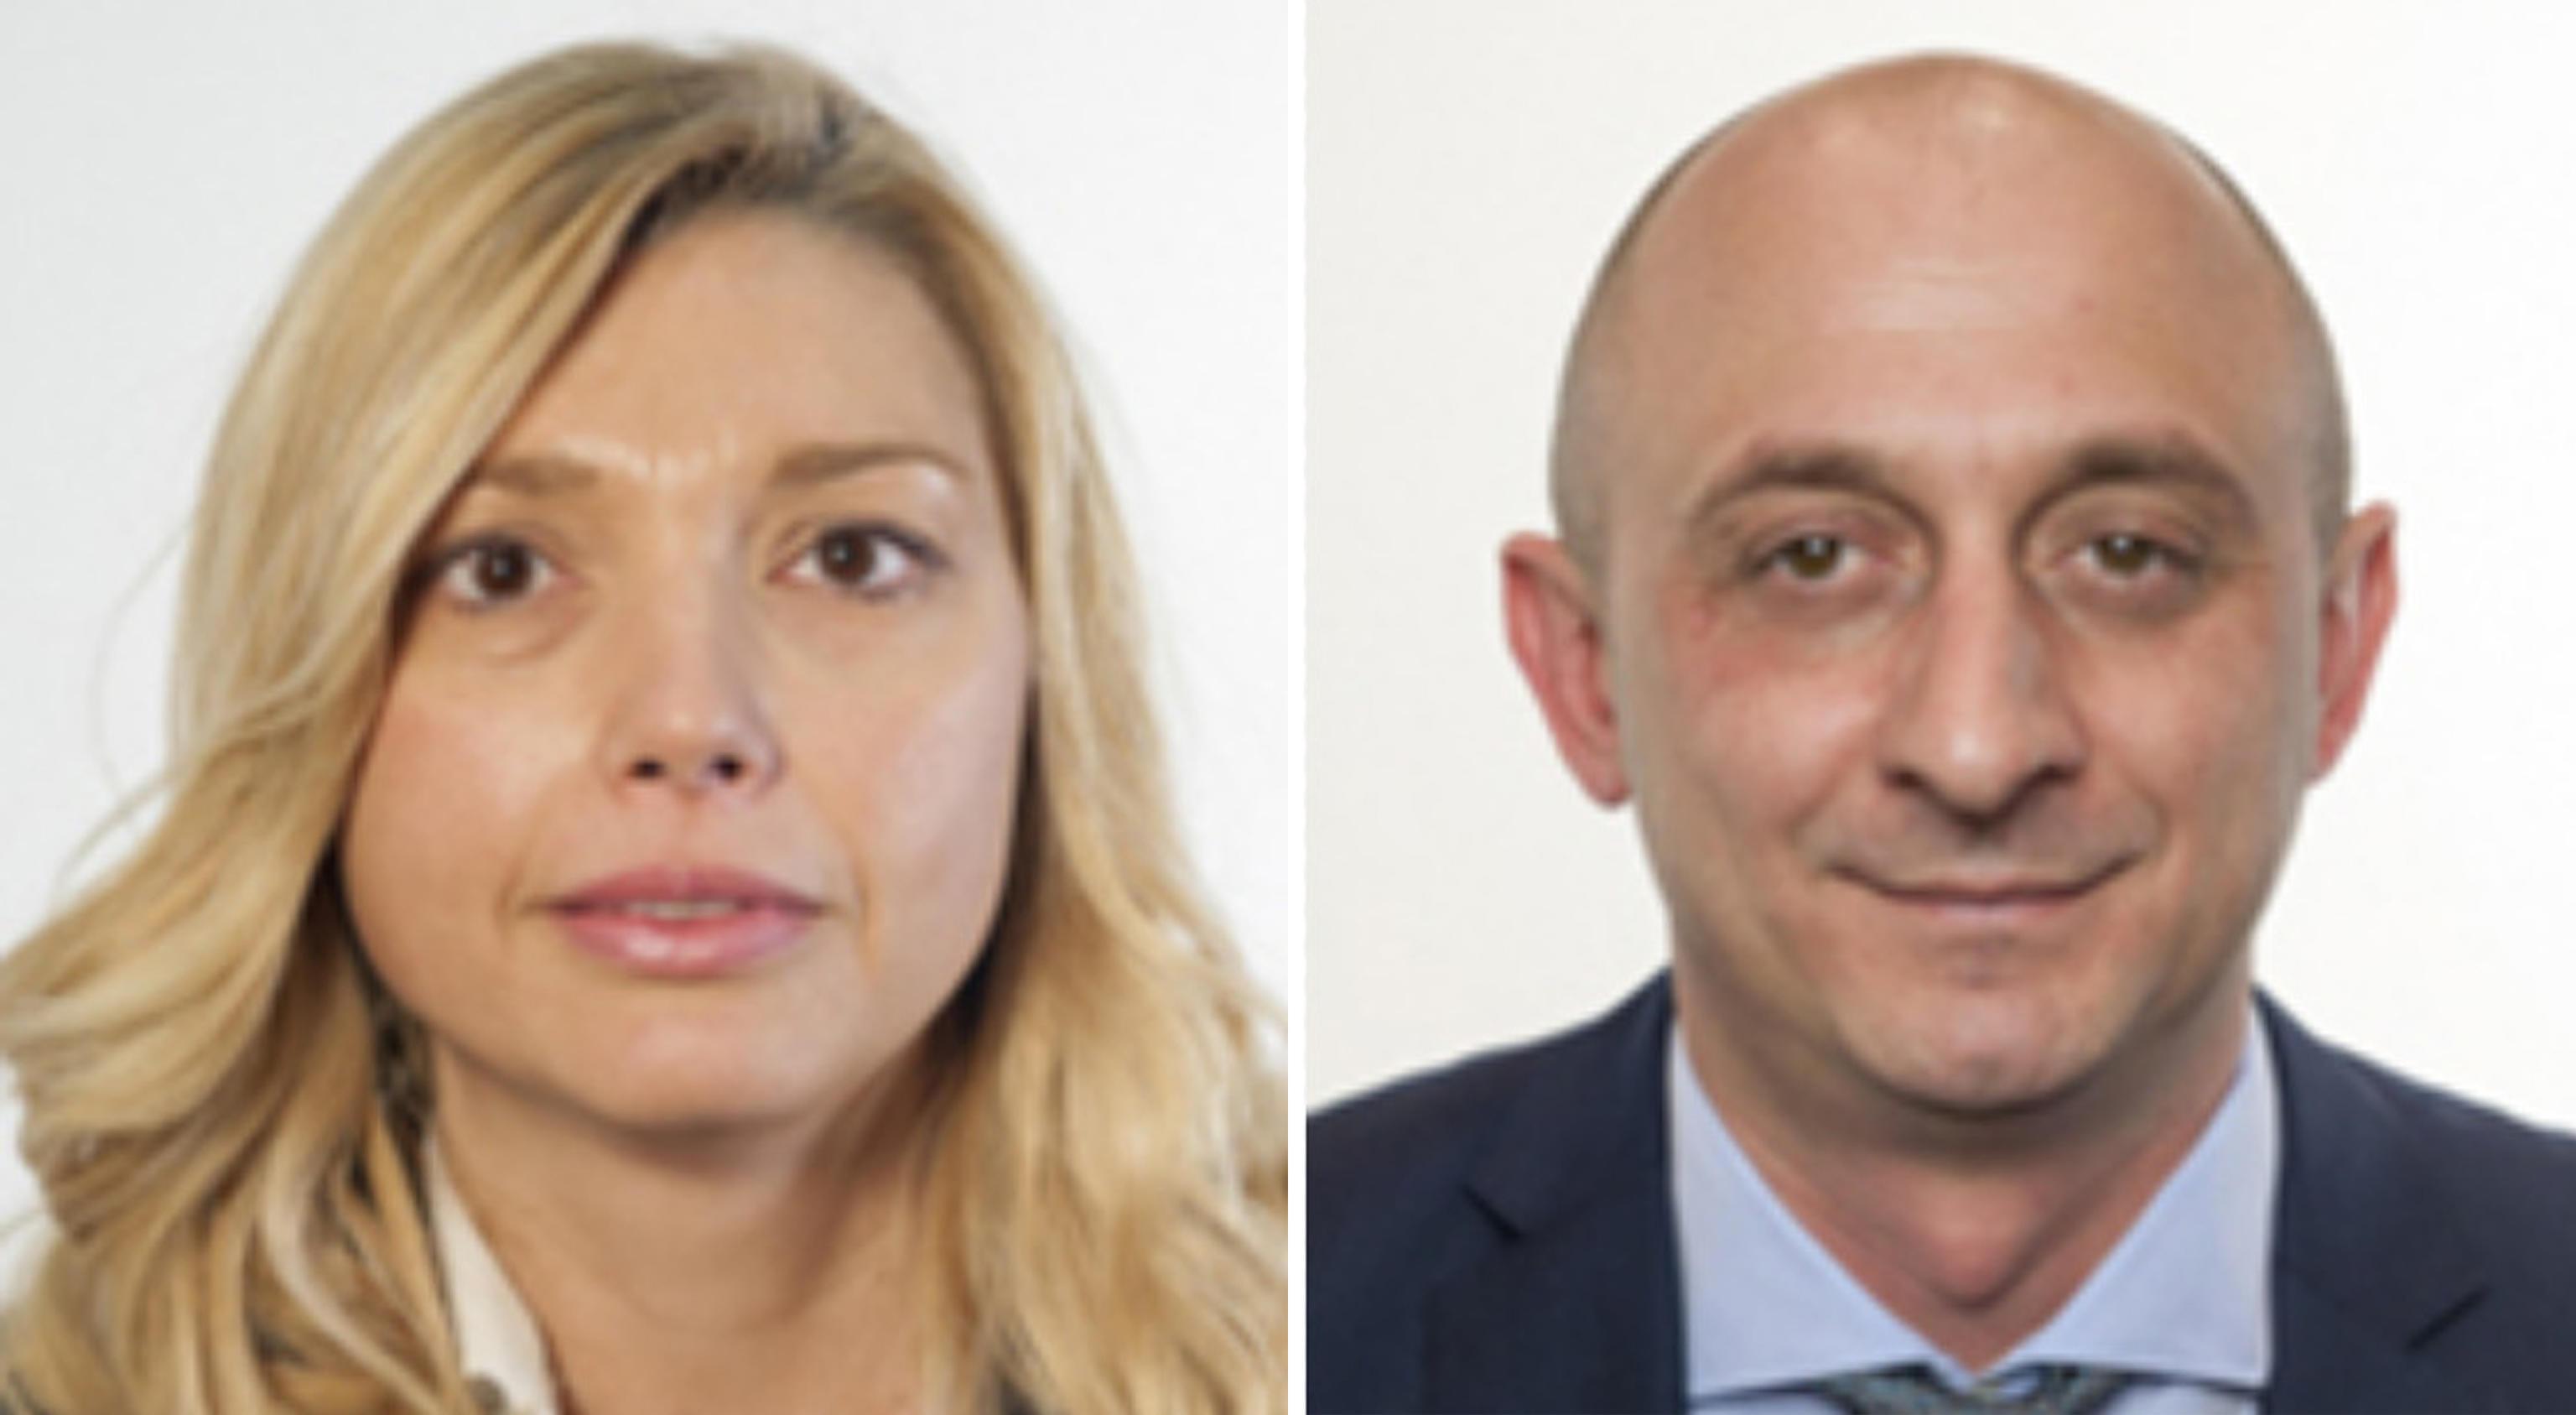 Elena Murelli e Andrea Dara, parlamentari sospesi dalla Lega